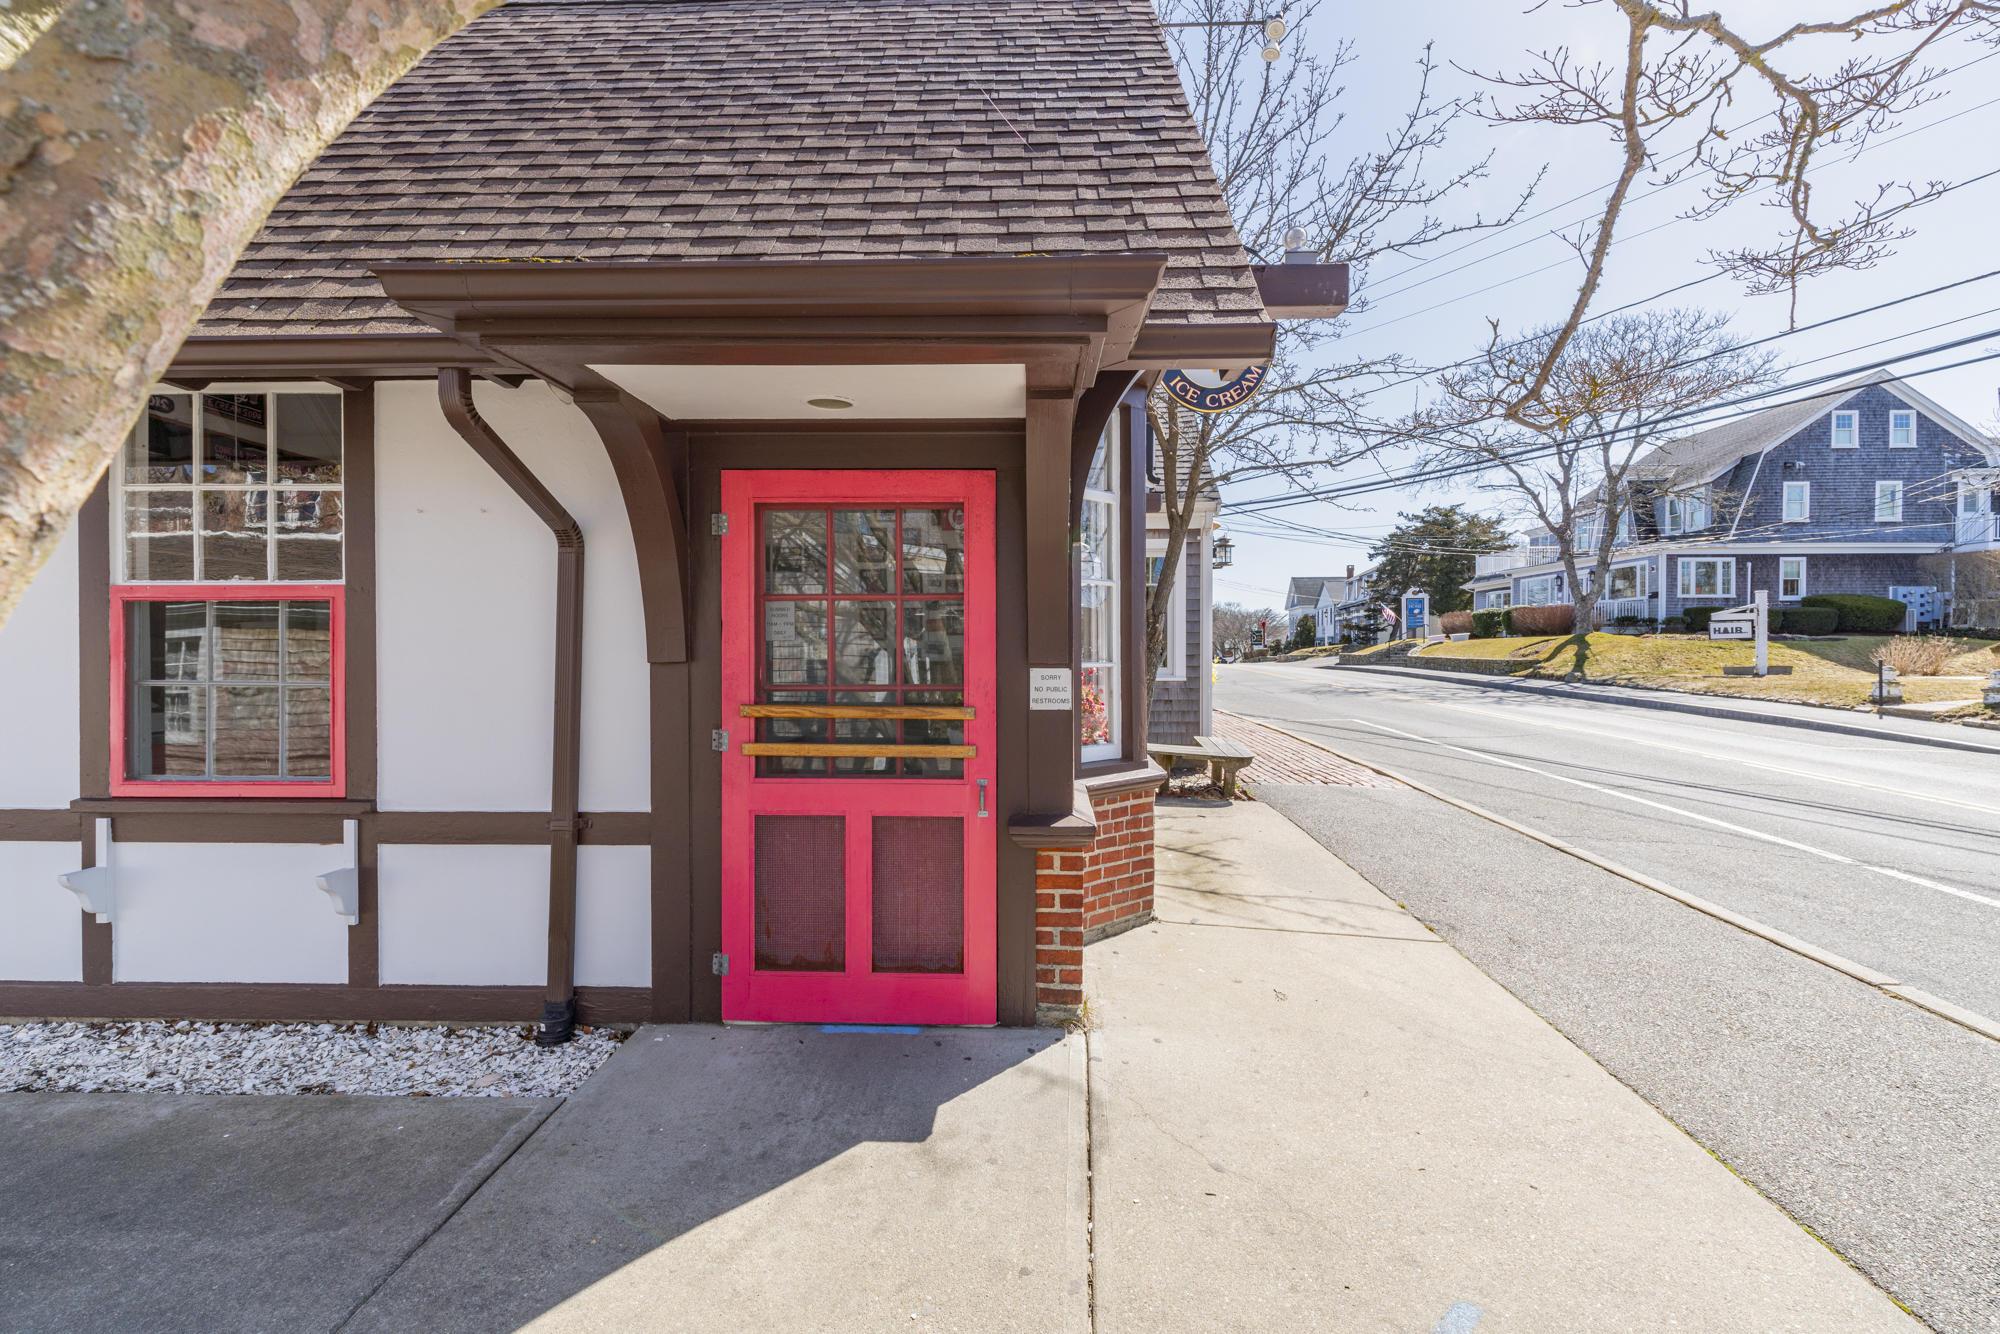 456 Main Street, Chatham, MA  02633 - slide 11